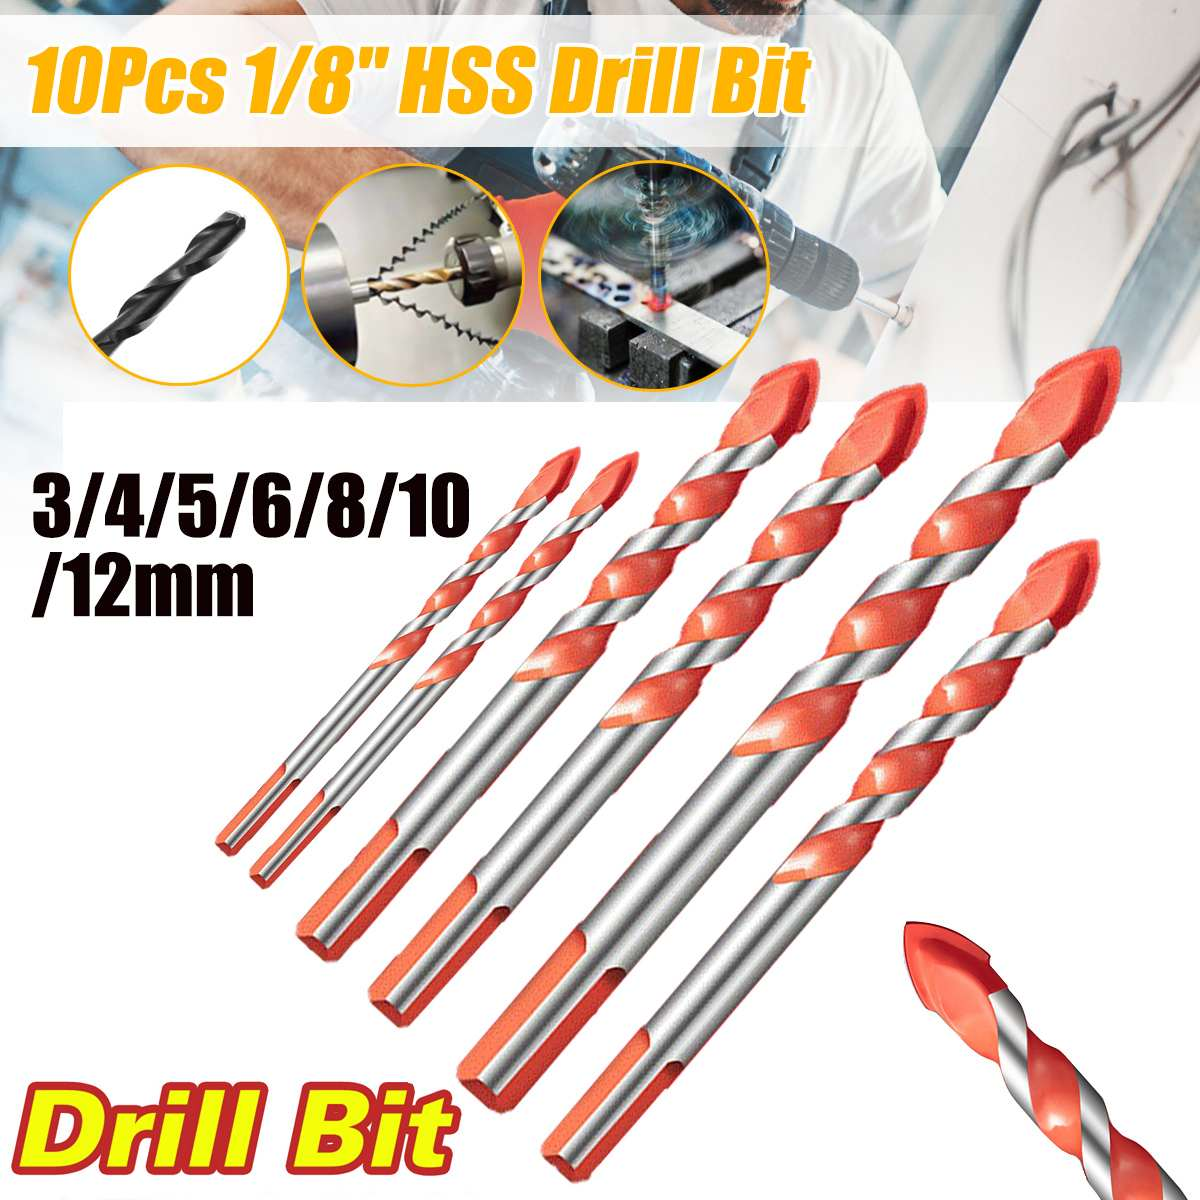 Drill Bit Triangle Shank Drill Multifunctional Ceramic Glass Hole Wall Cobalt Twist Spiral Bit Tile Concrete Drill Bit Tool 7PCS